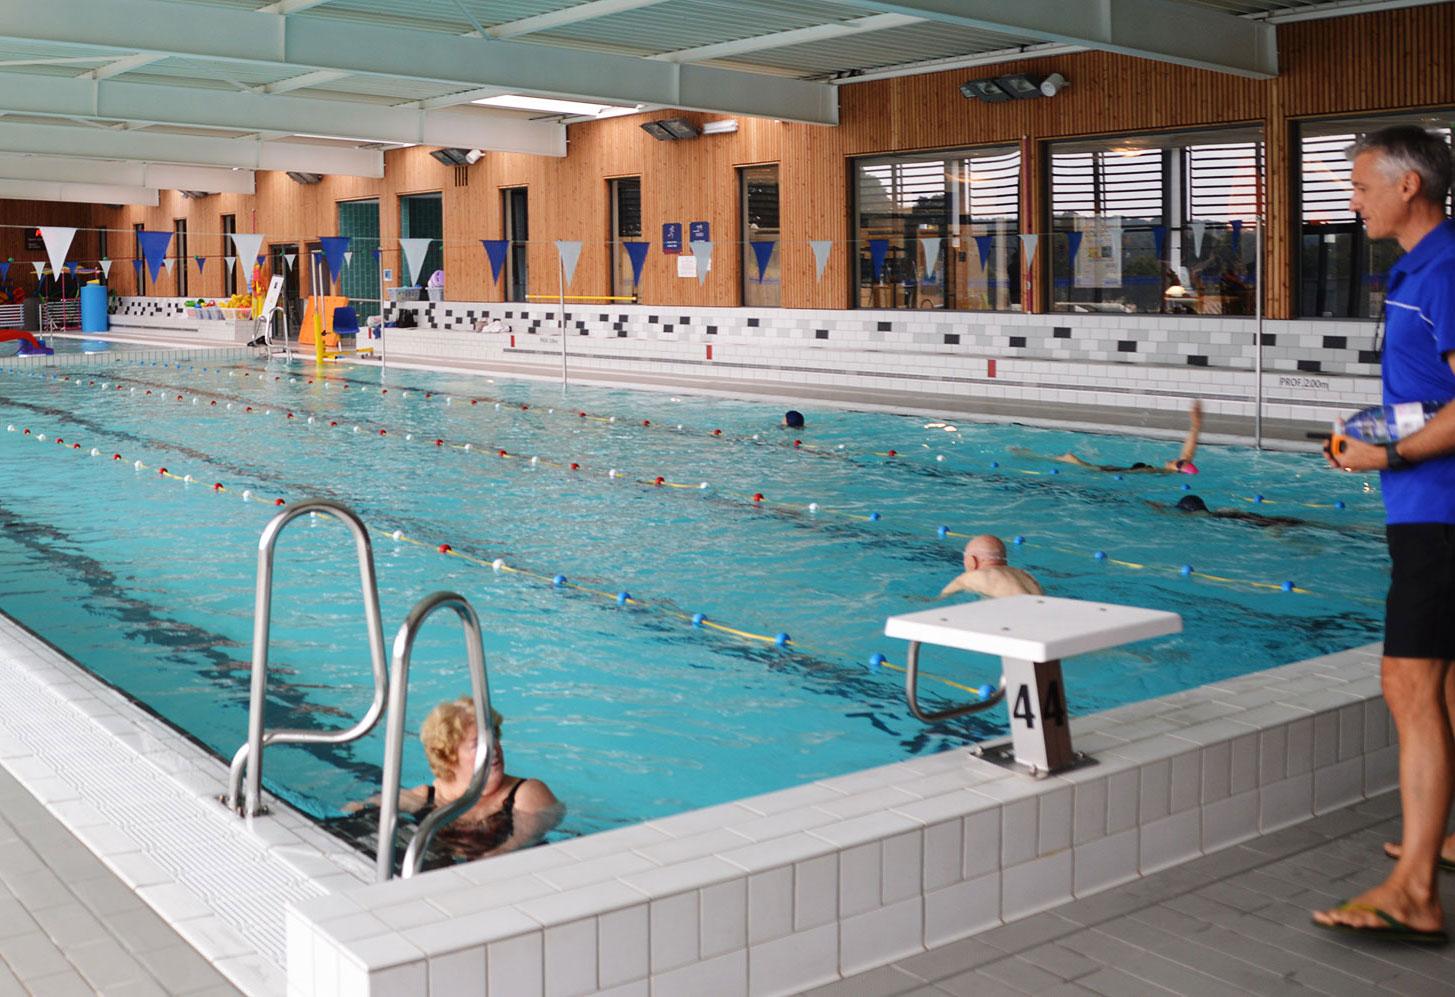 Blavet prestalis for Chateaugiron piscine